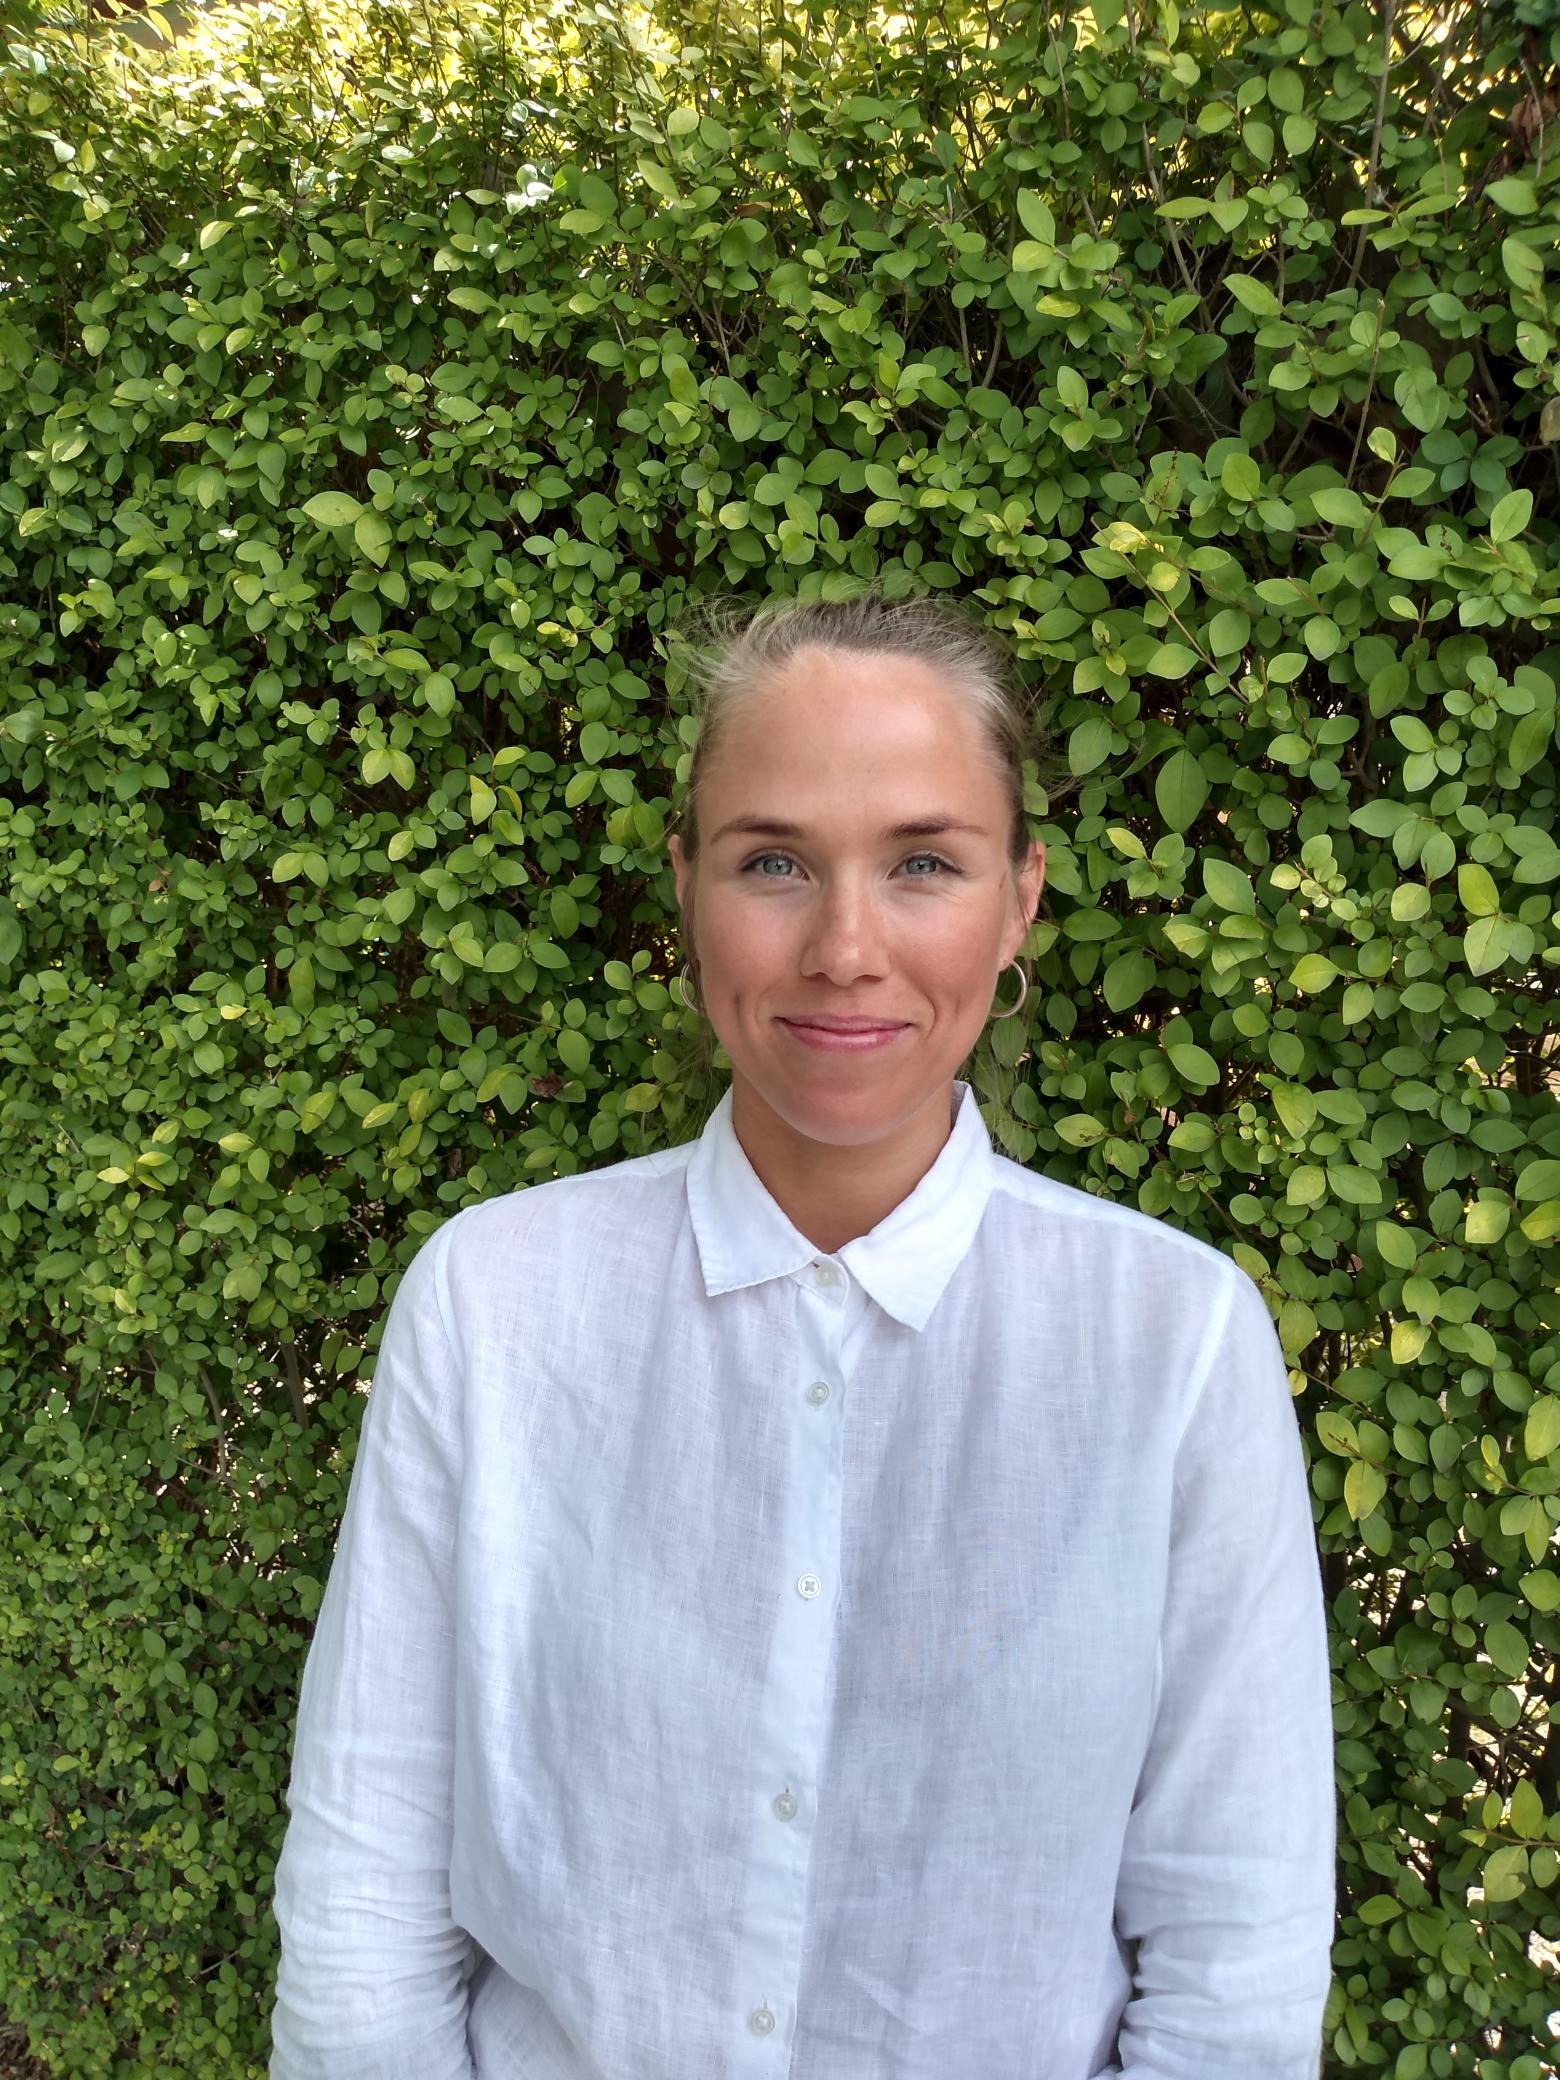 Erin Oldenhof